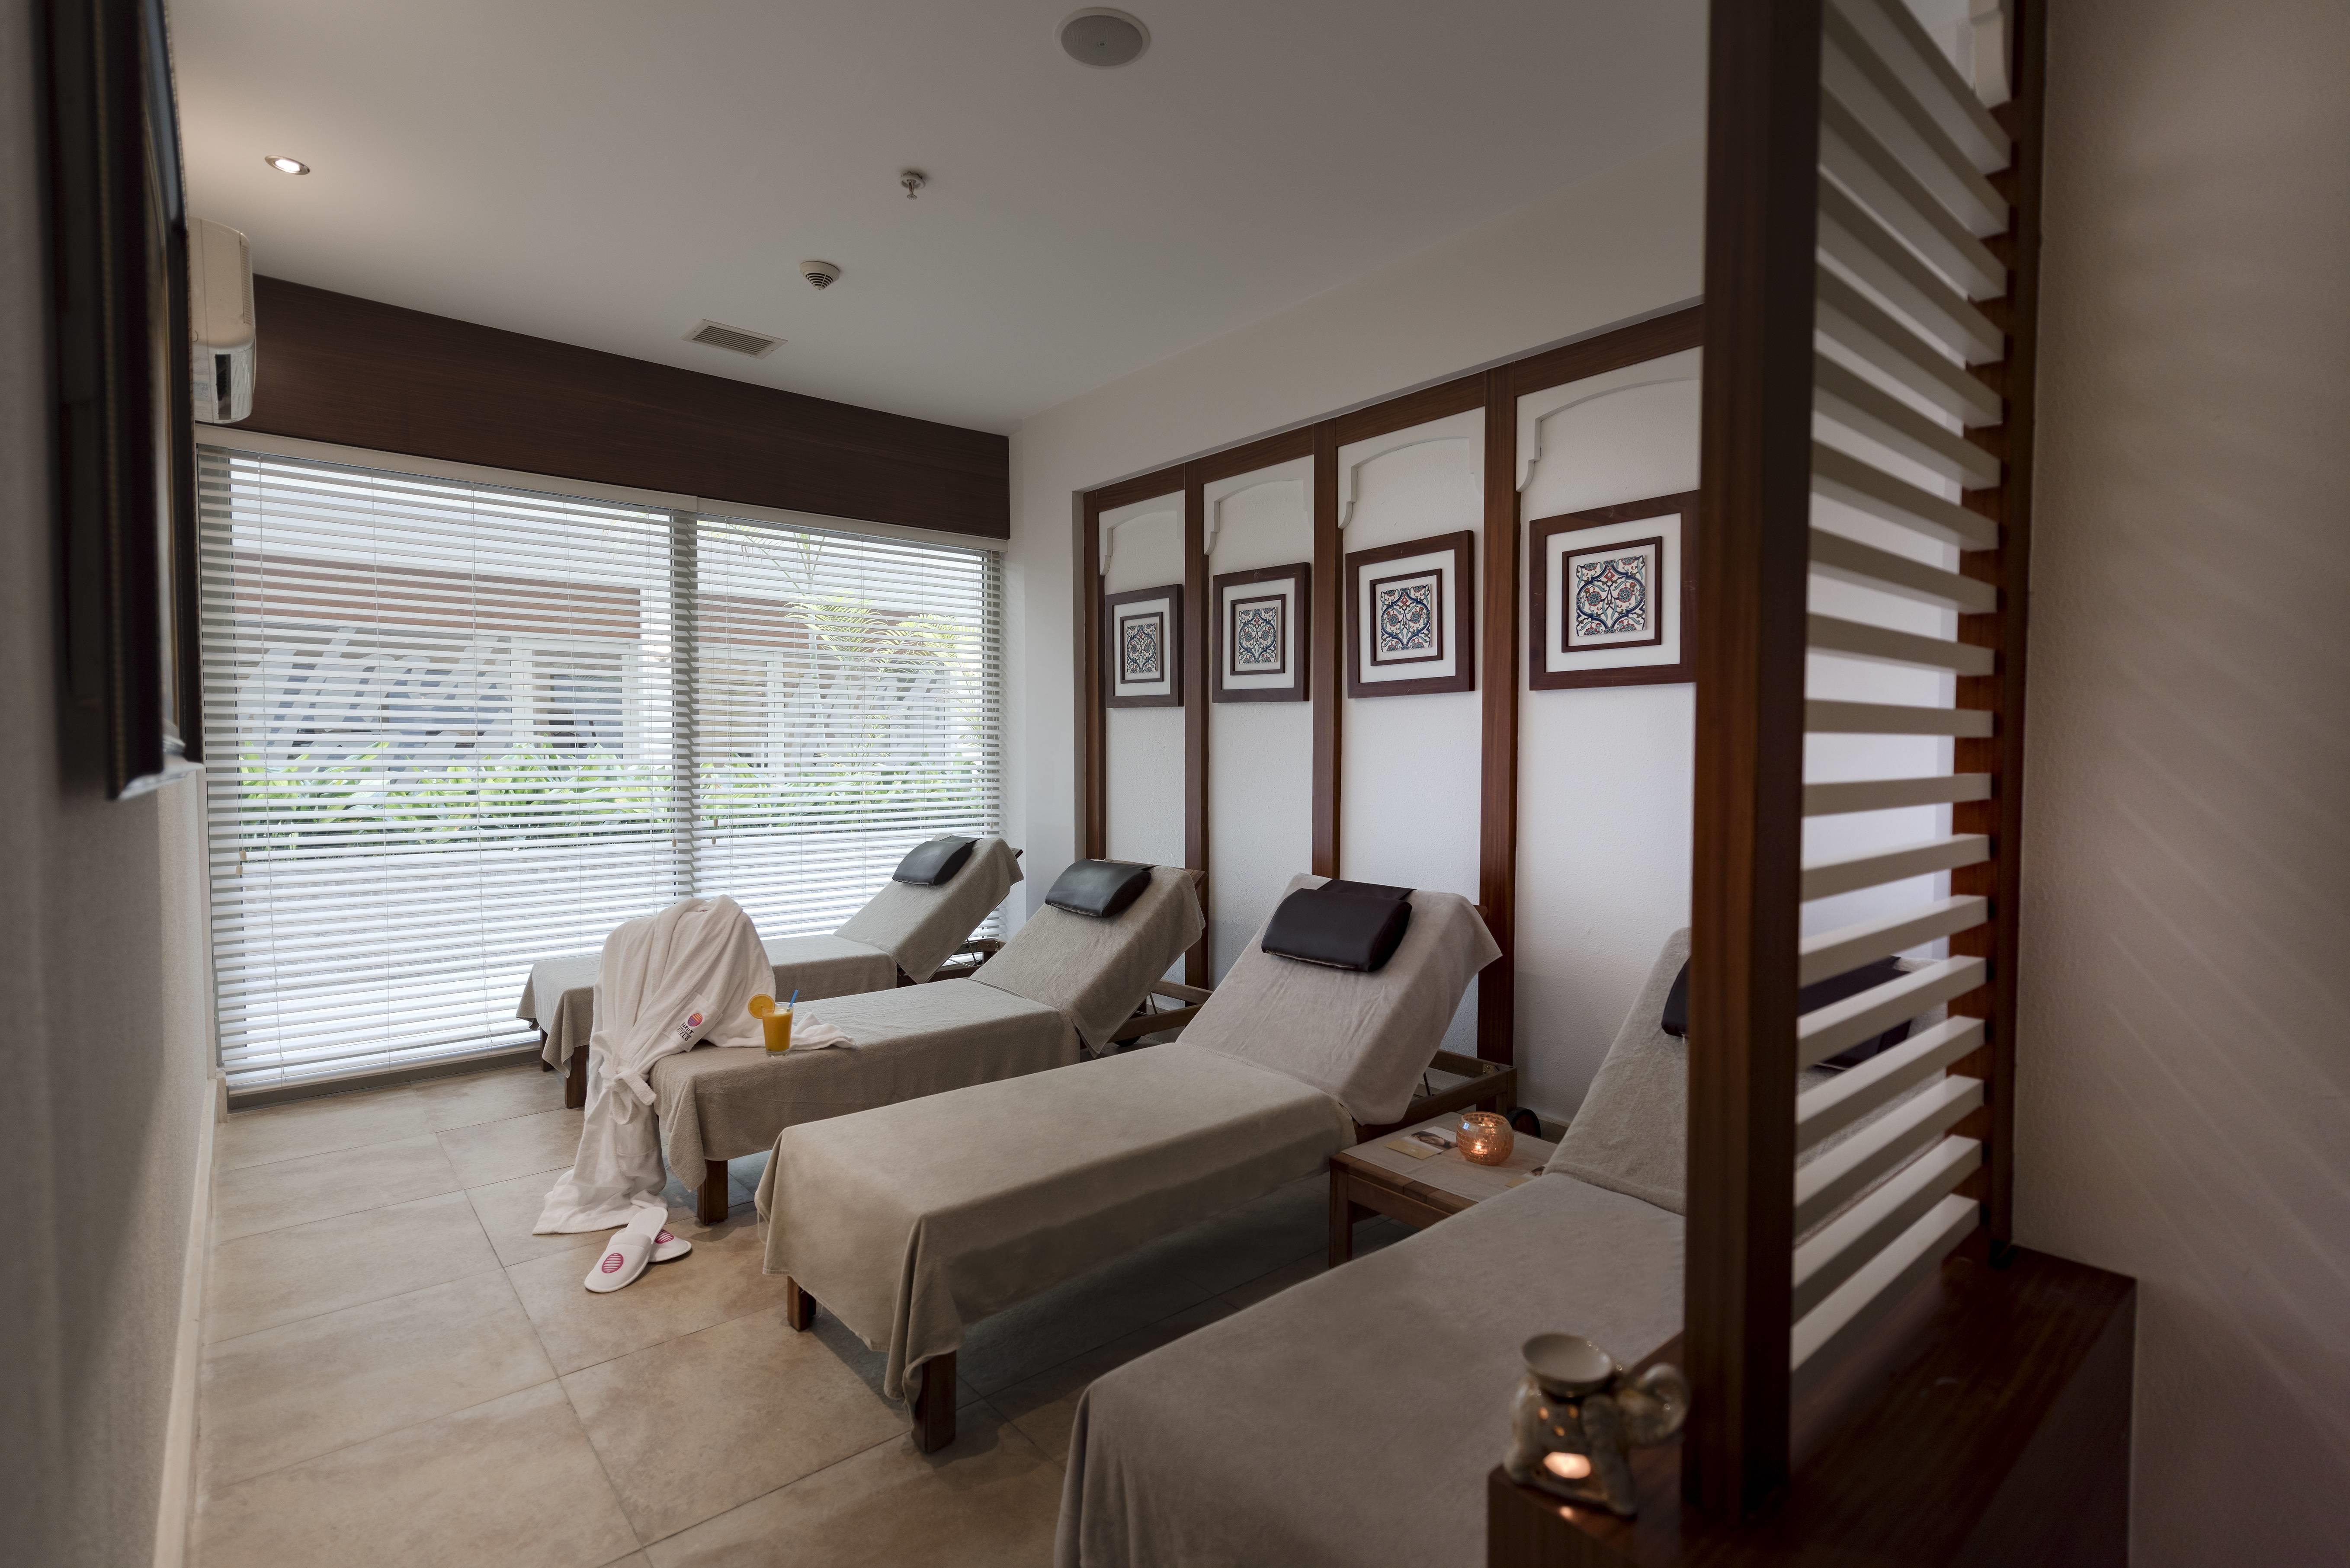 Barut B Suites 4* - spa